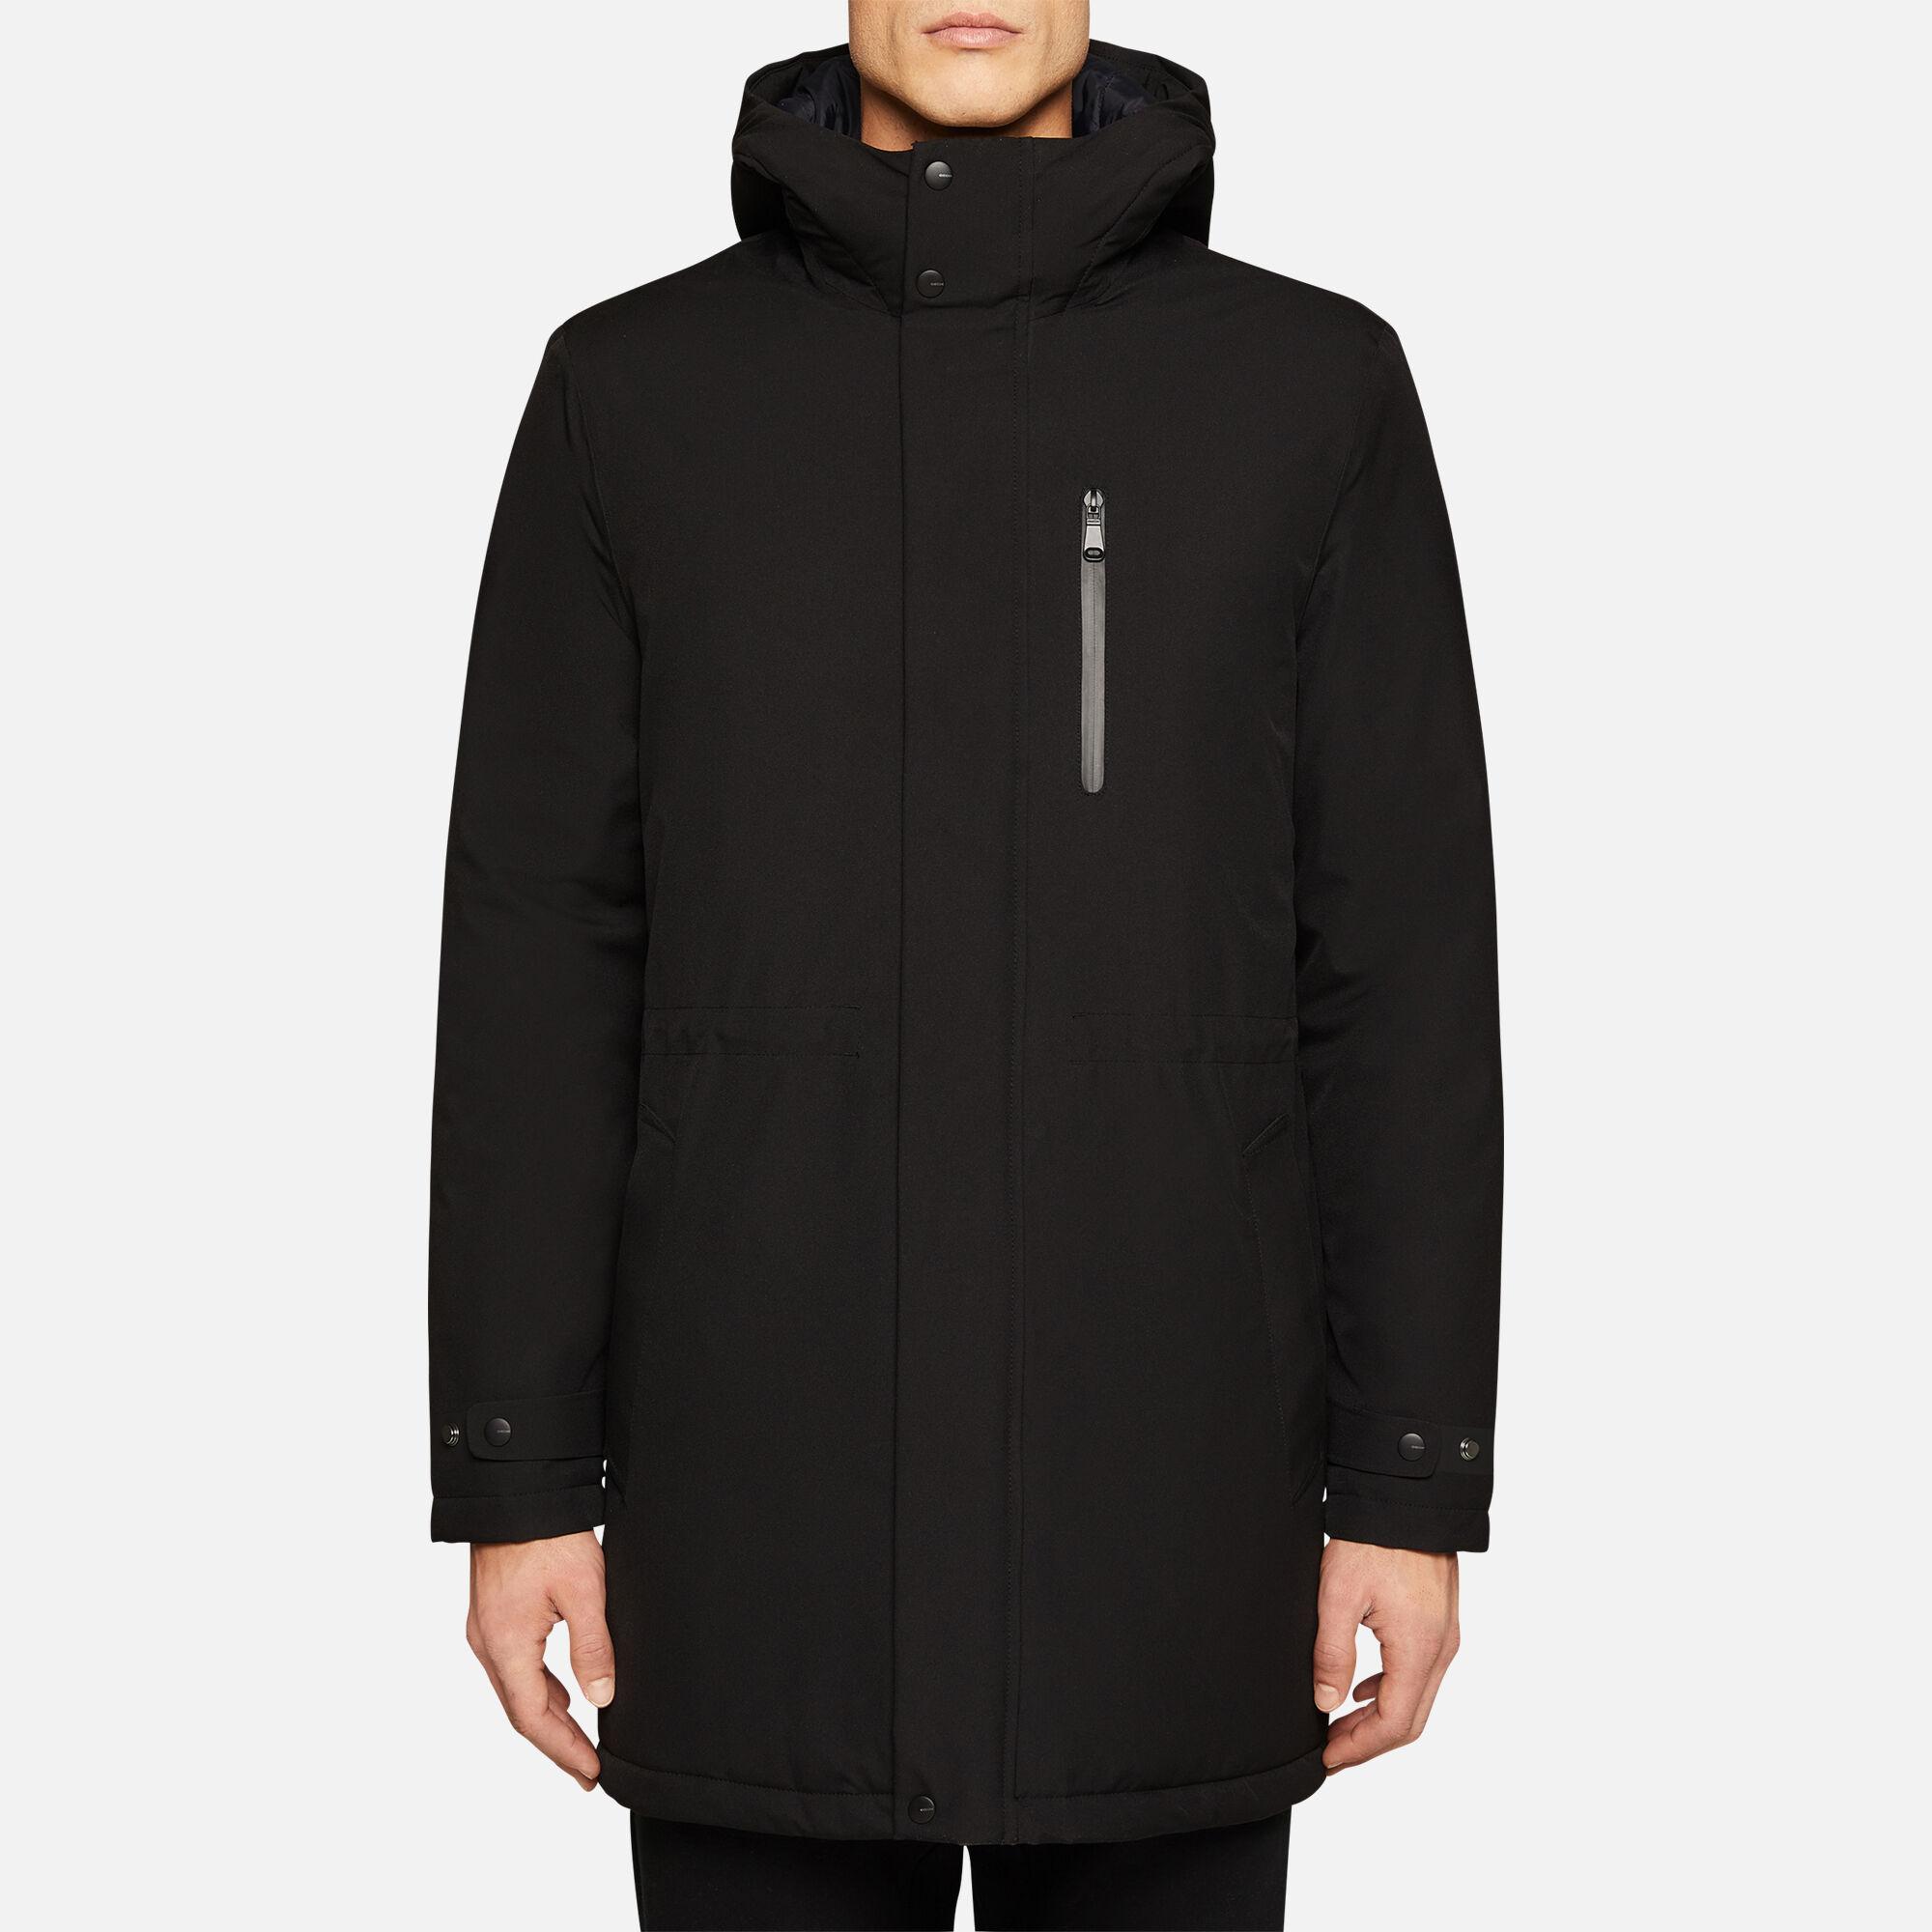 giacca a vento uomo marca GEOX taglia 52